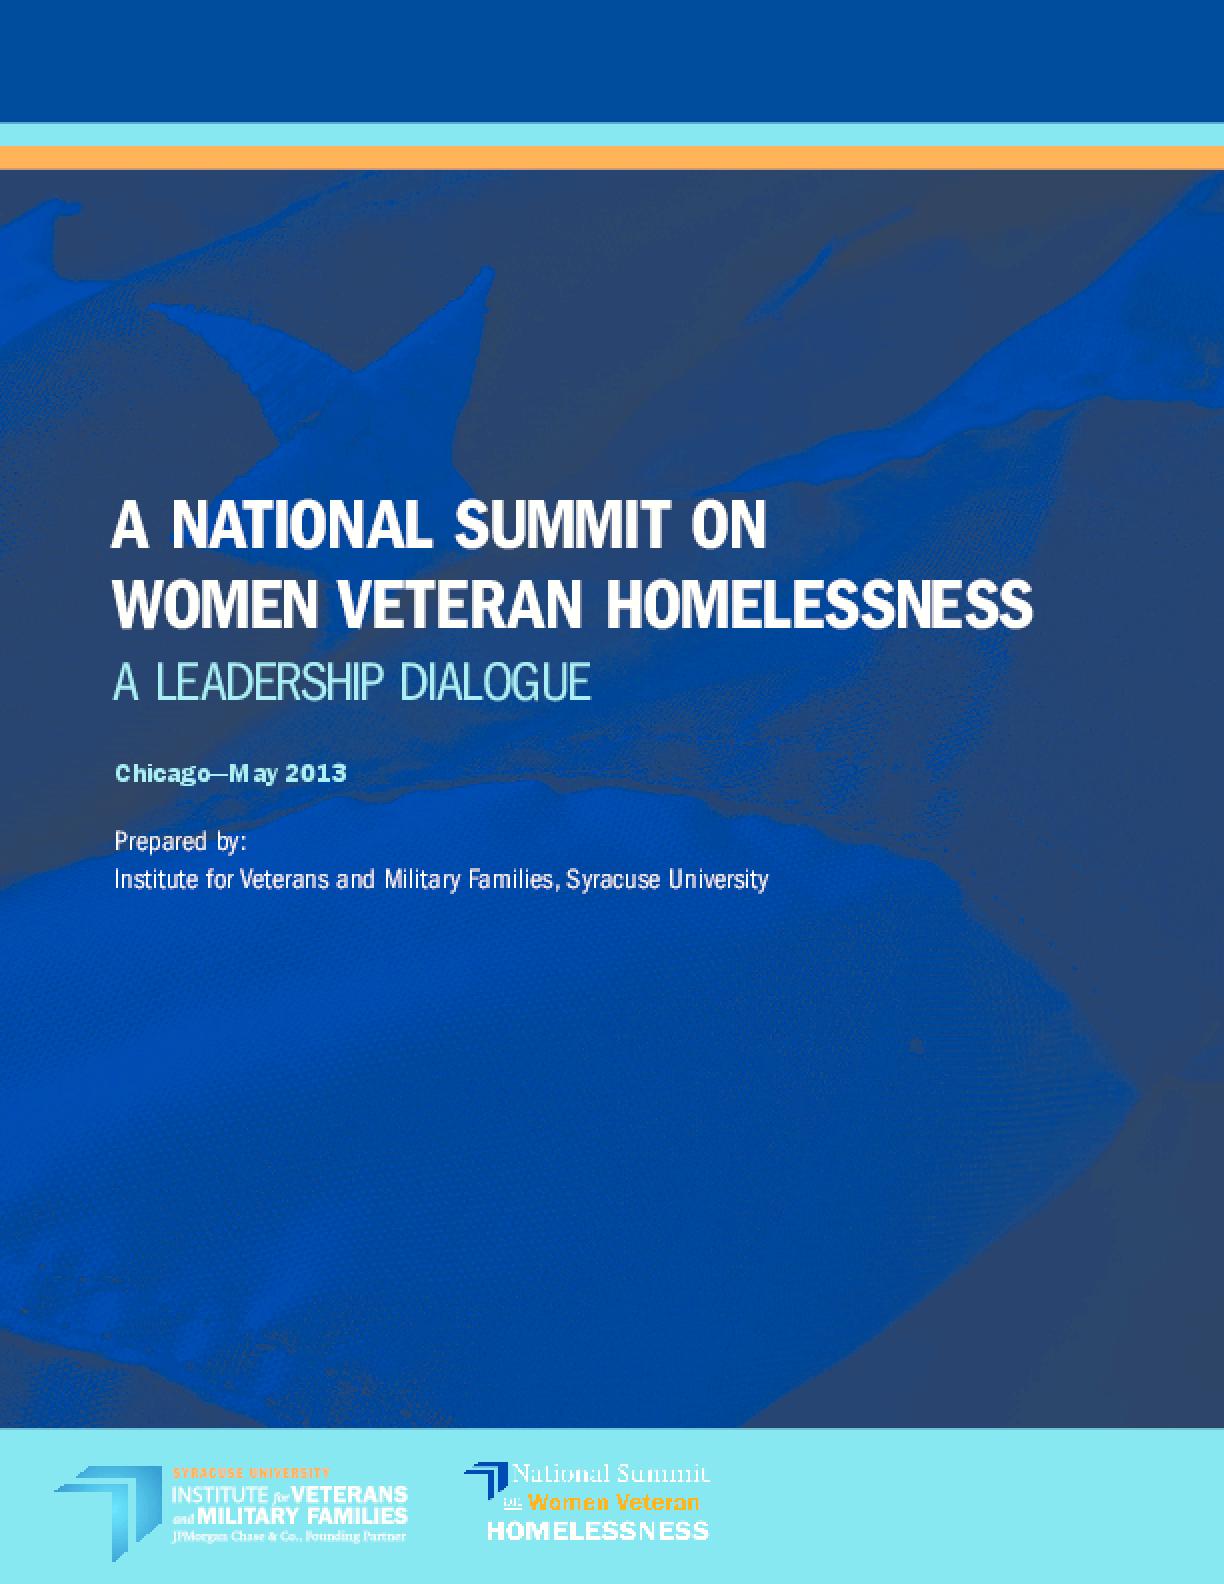 A National Summit on Women Veteran Homelessness: A Leadership Dialogue